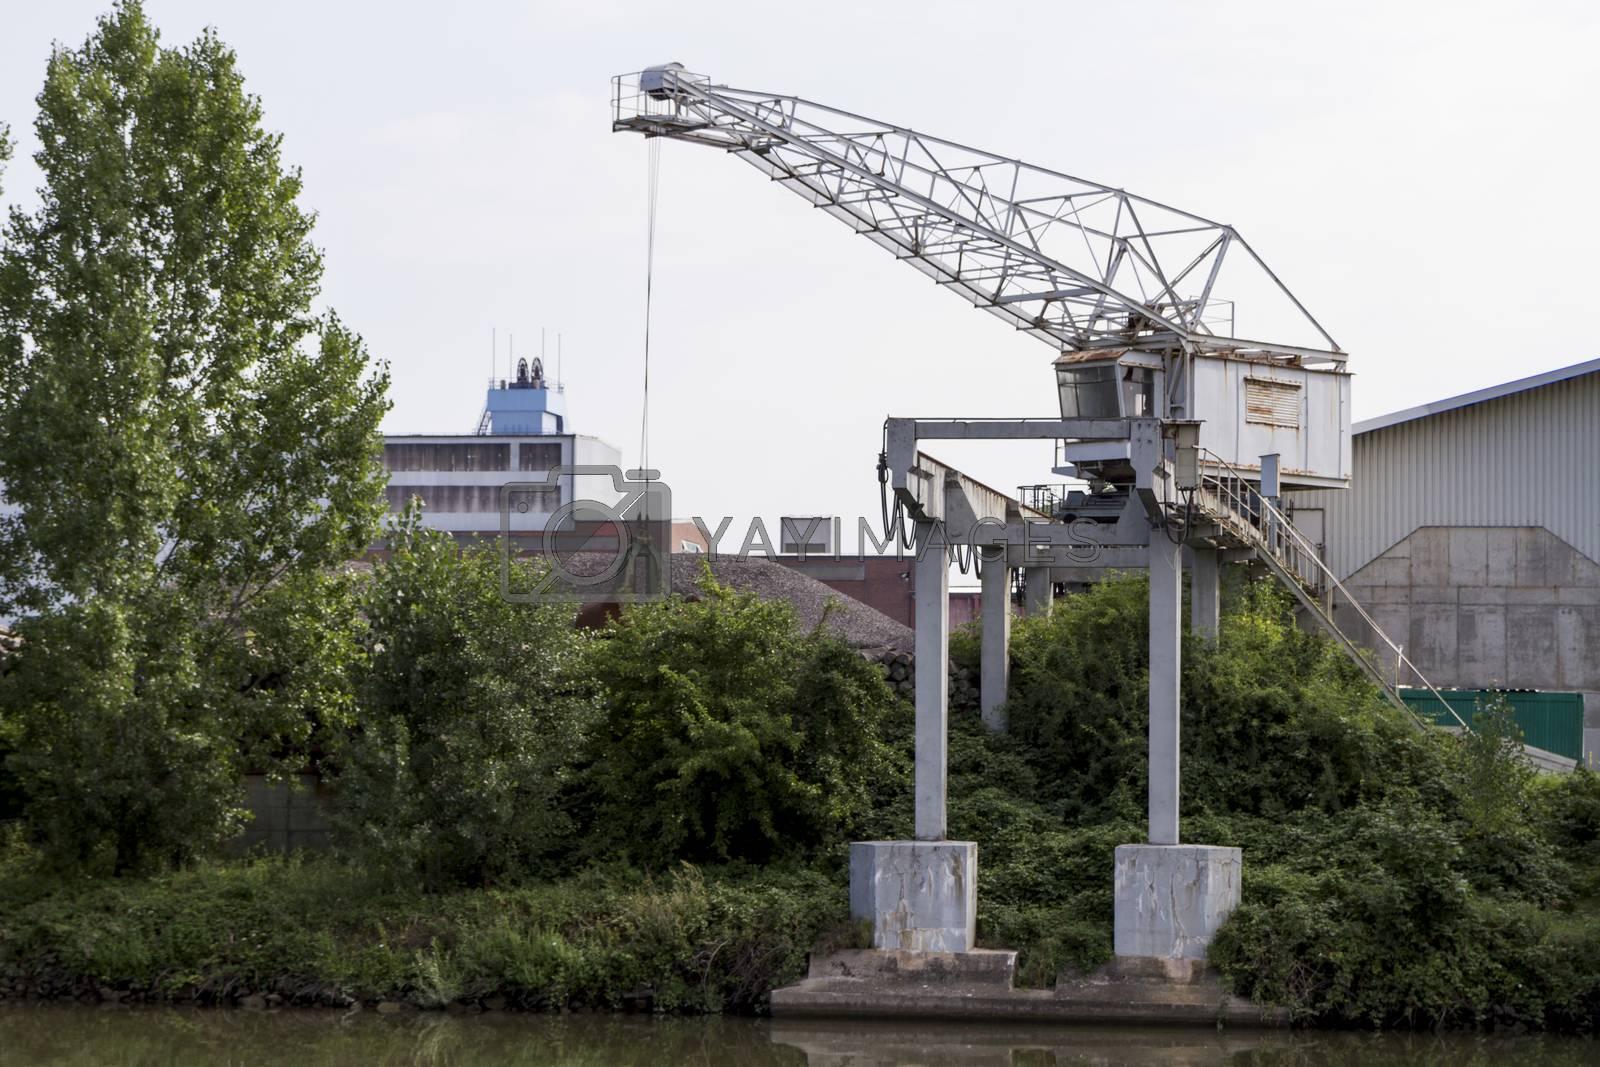 small, old dockside crane at river Neckar in germany